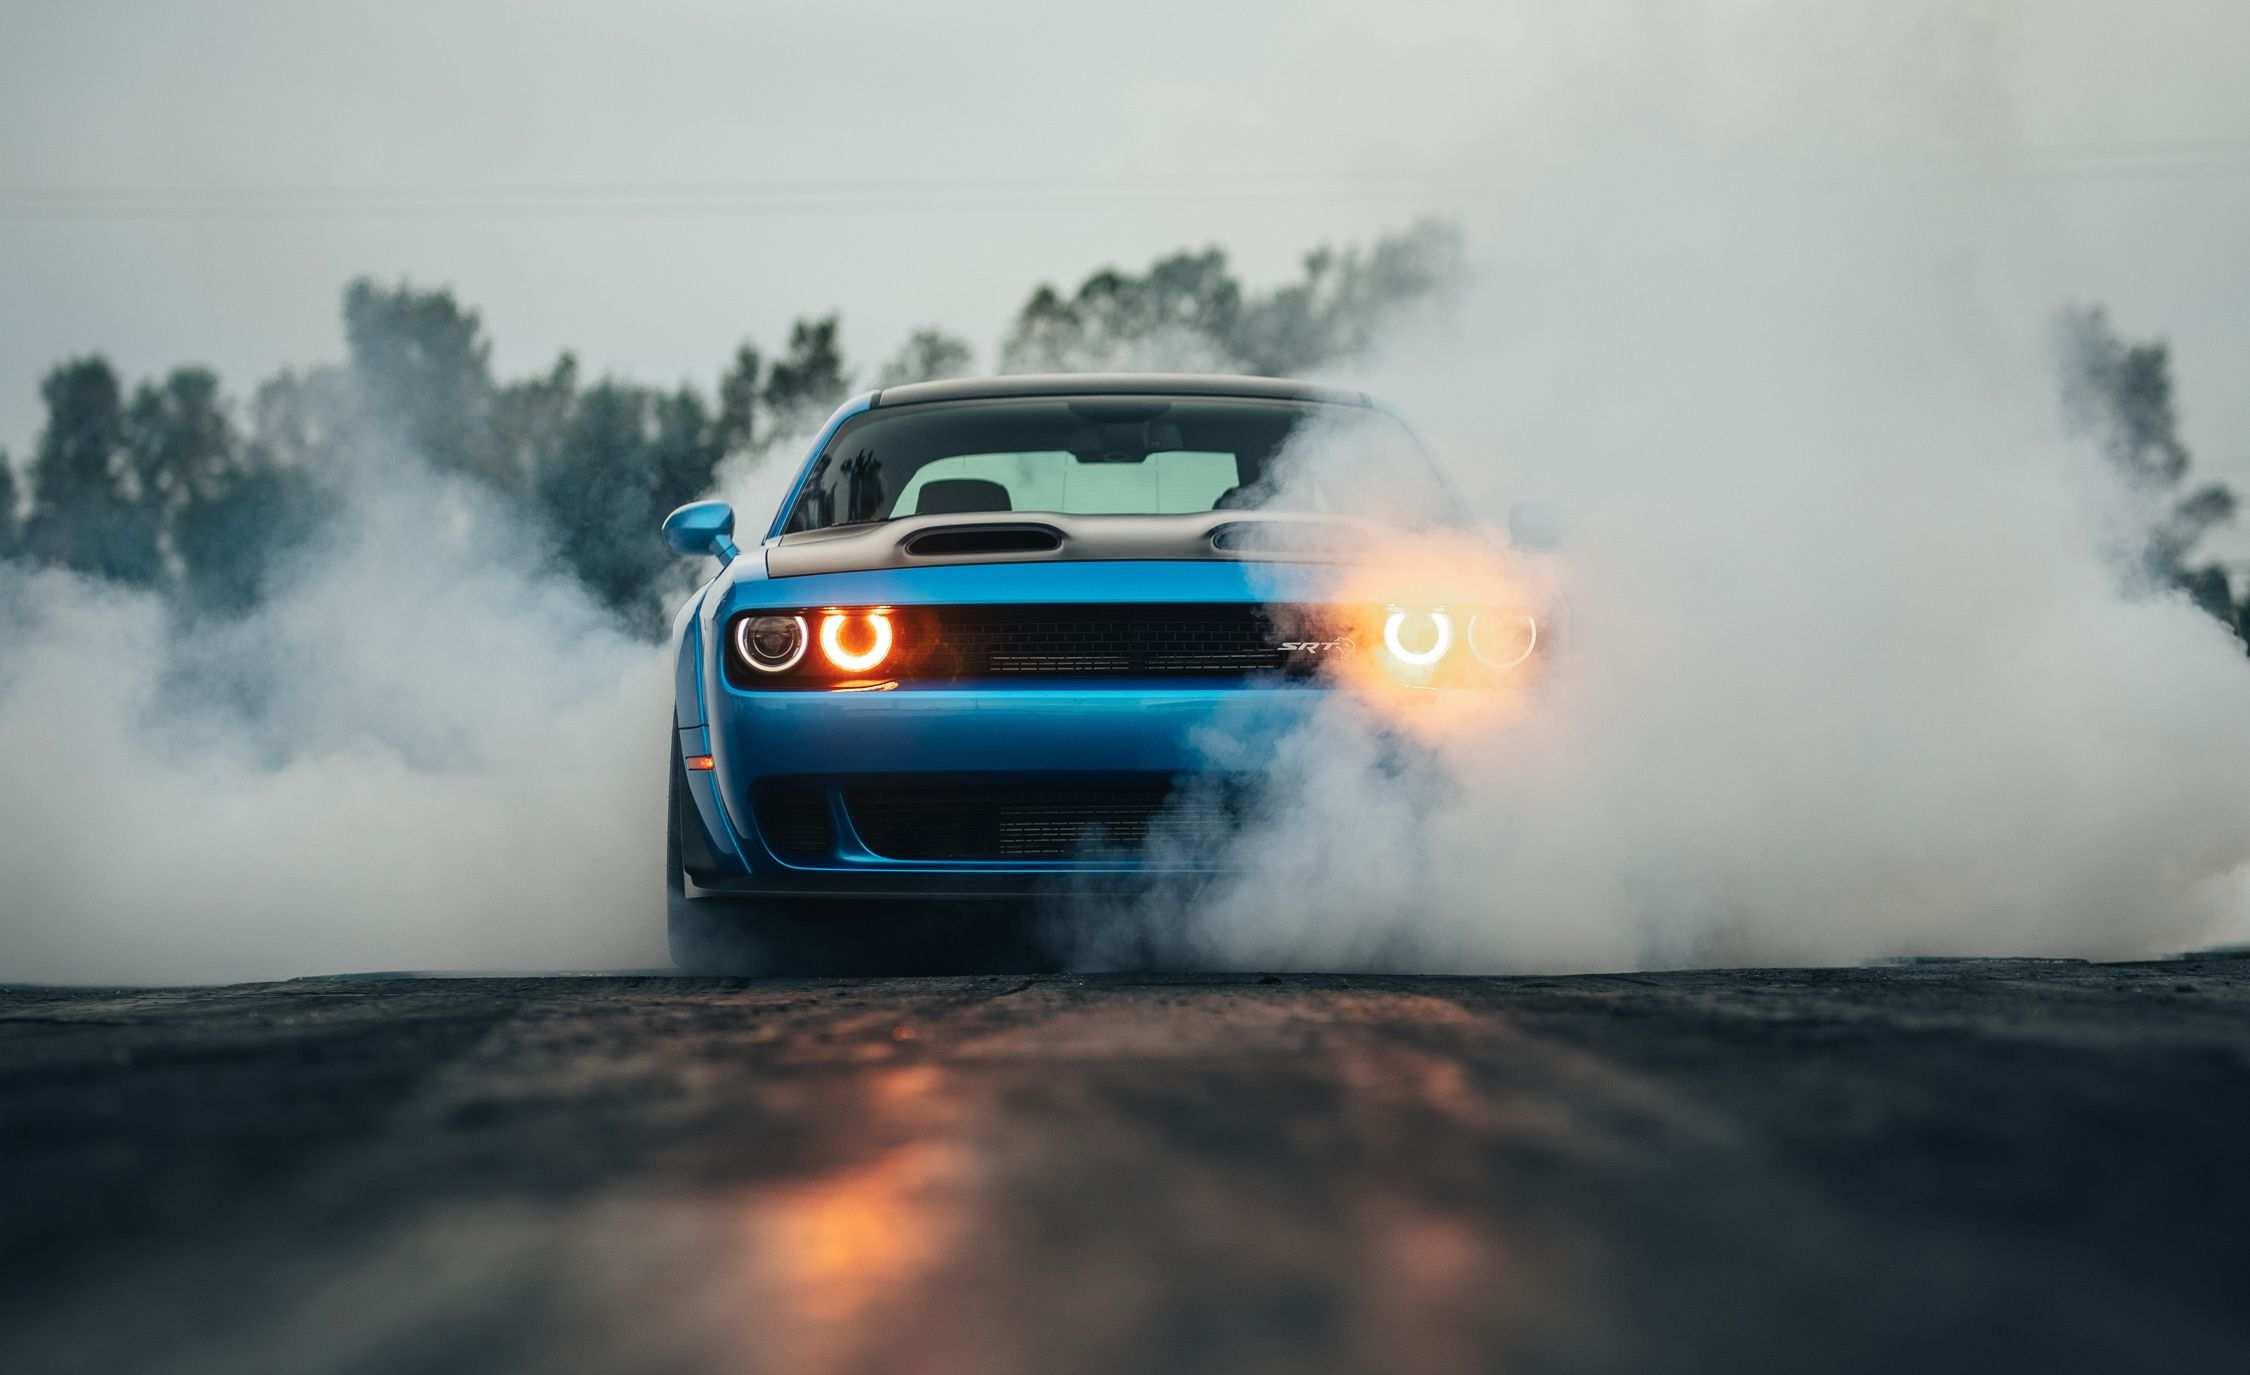 14 Best Review New Dodge 2019 Challenger Hellcat Exterior Price and Review with New Dodge 2019 Challenger Hellcat Exterior